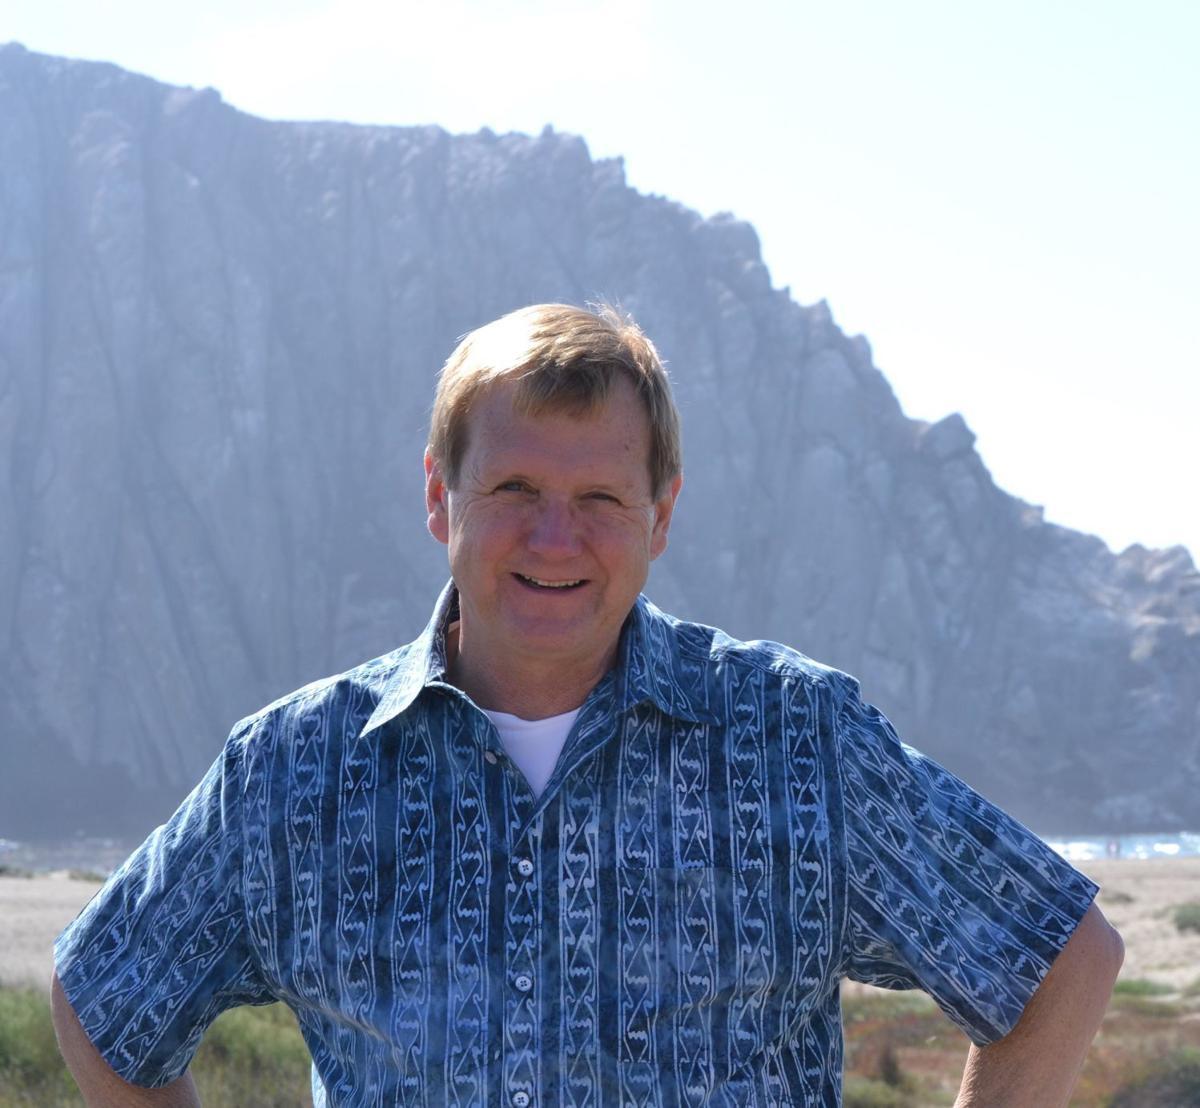 Mark James Miller